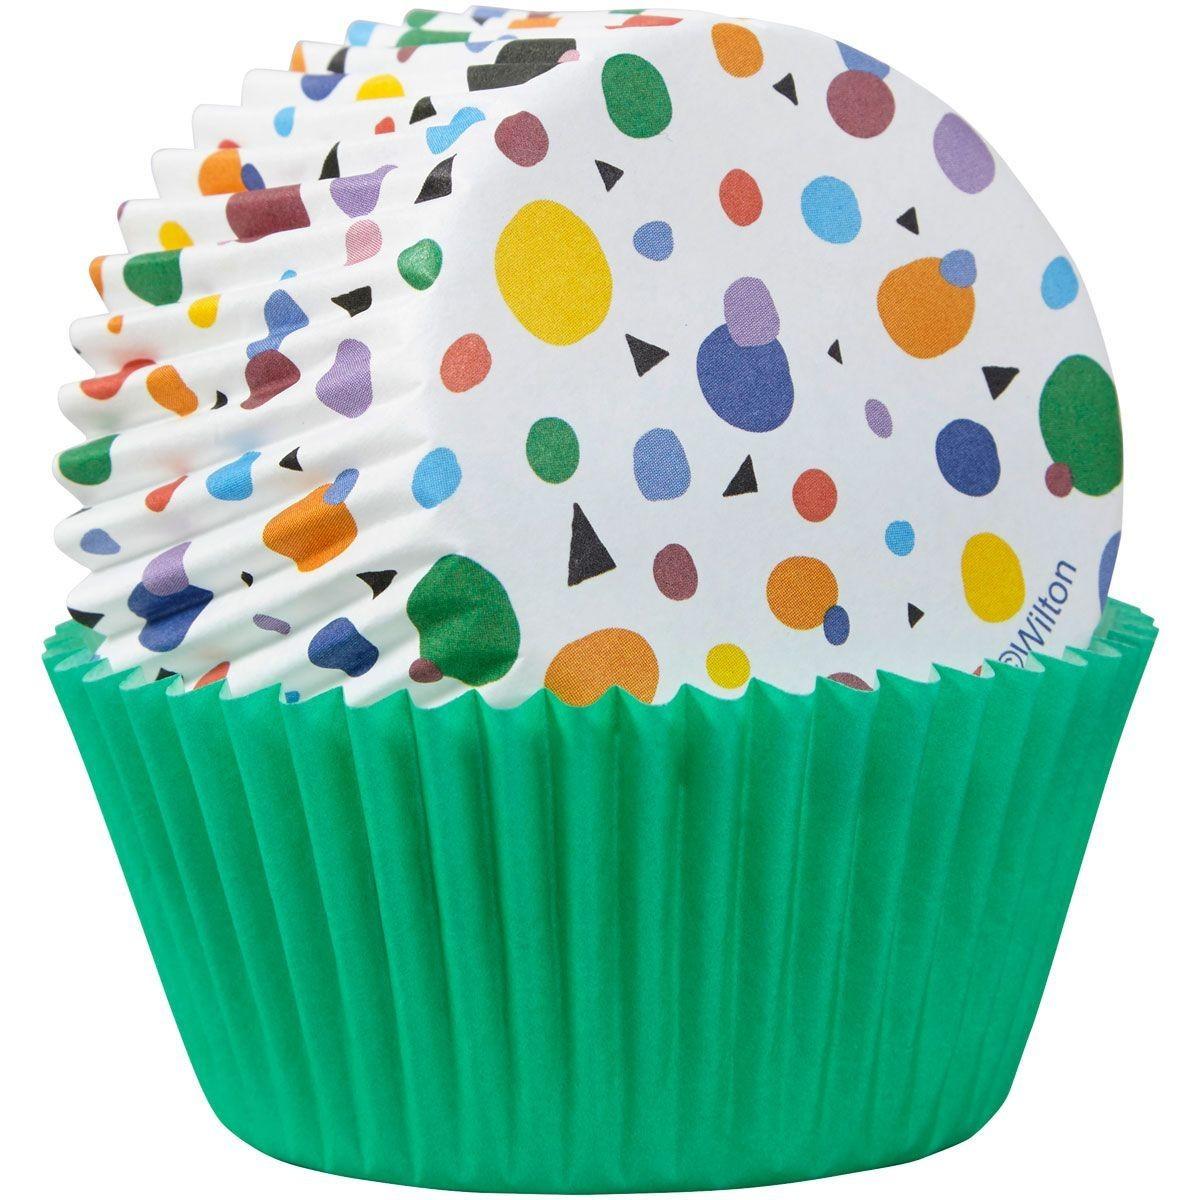 SALE!!! Wilton -Cupcake Cases -MAX DOTS TRIANGLES - Θήκες Ψησίματος Κουκκίδες και Τρίγωνα 75τεμ